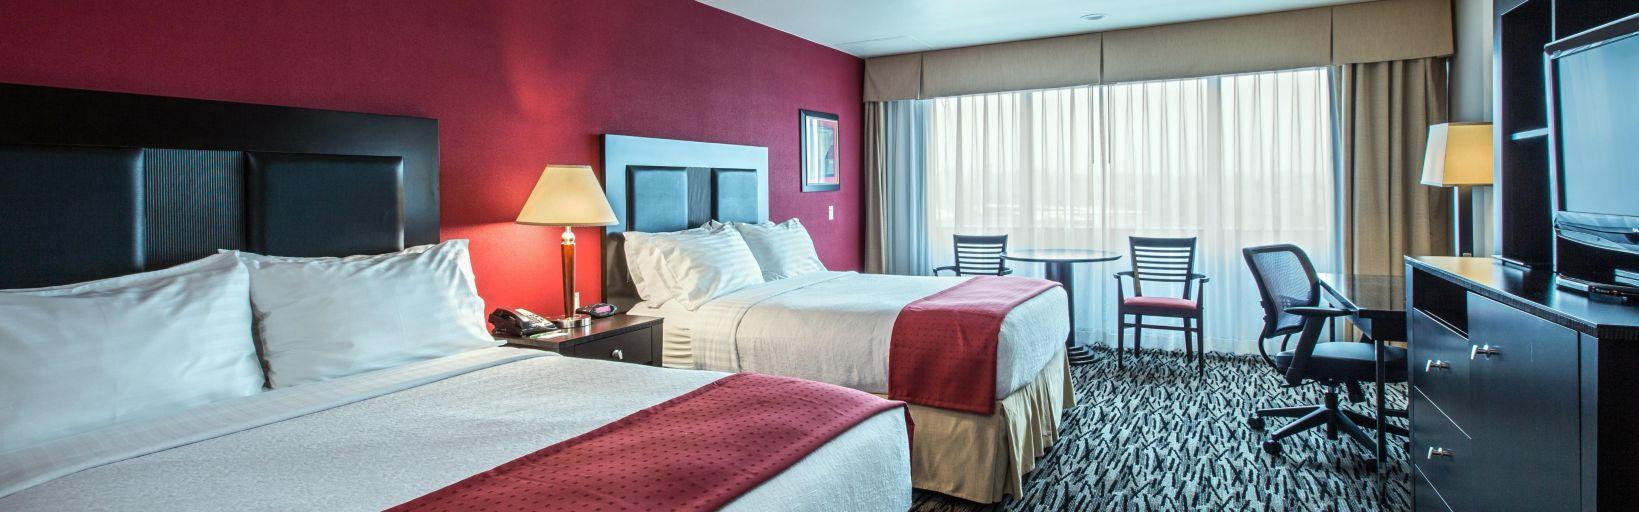 Holiday Inn Hotel & Suites Anaheim - Fullerton Hotel by IHG